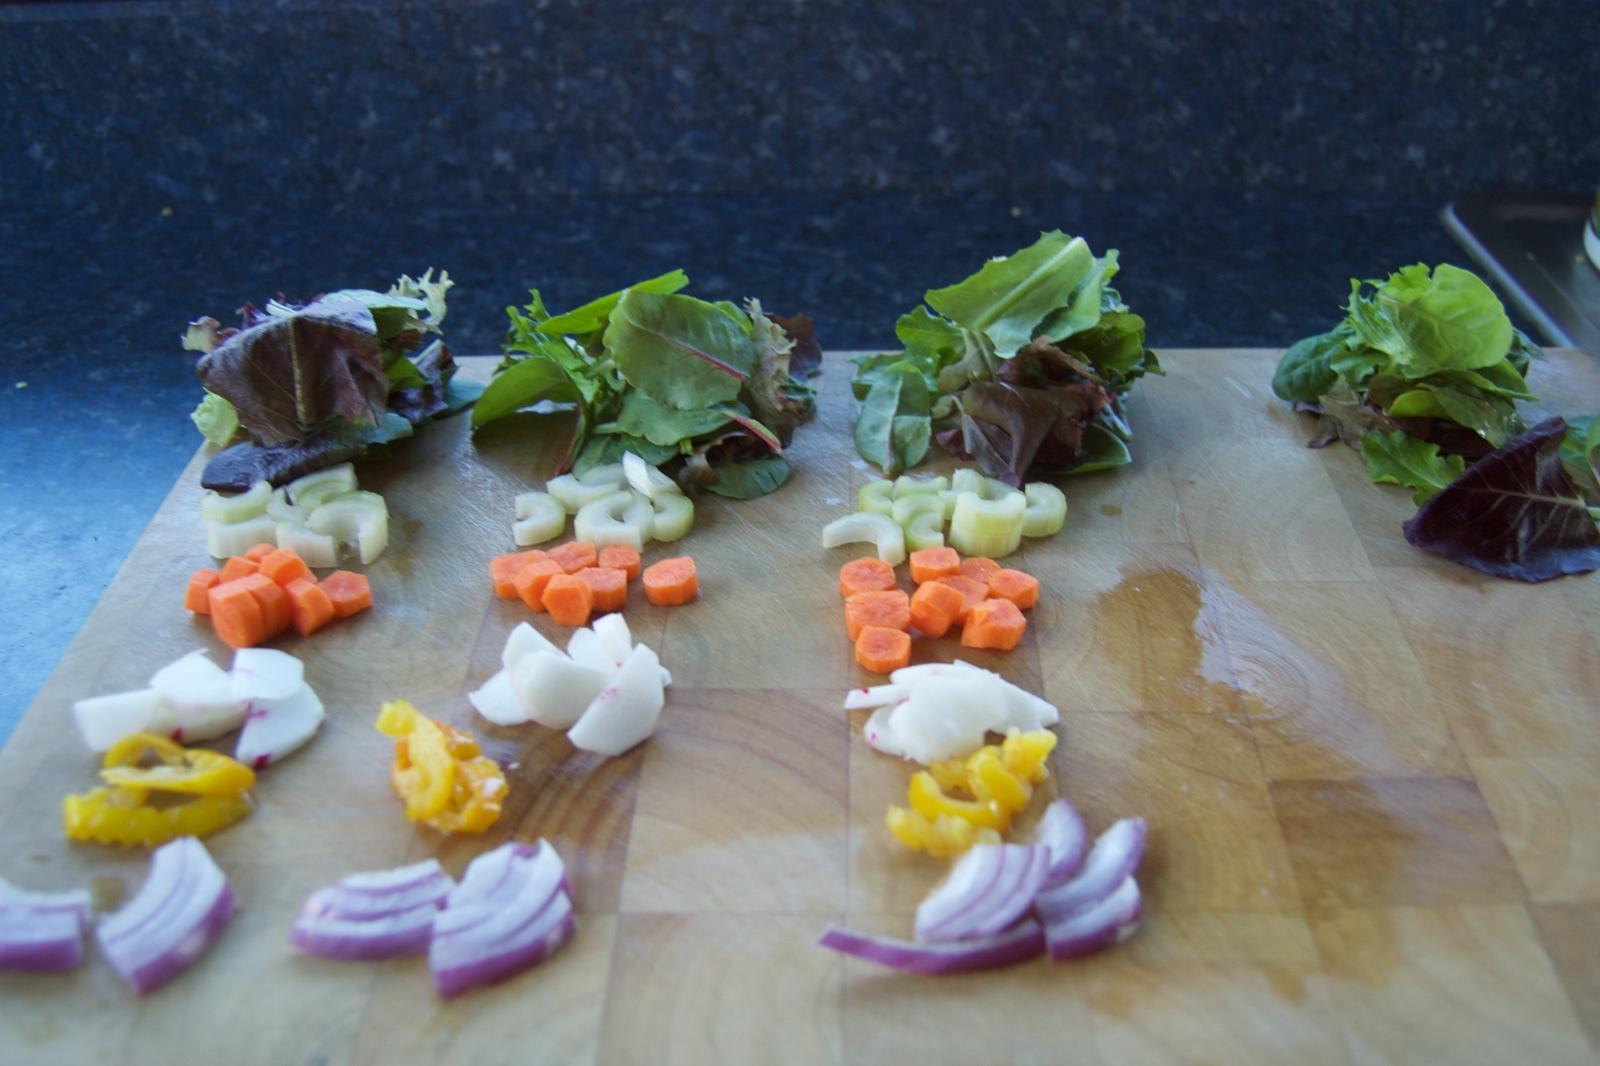 http://blog.rickk.com/food/2015/11/17/ate.2015.11.17.c1.jpg